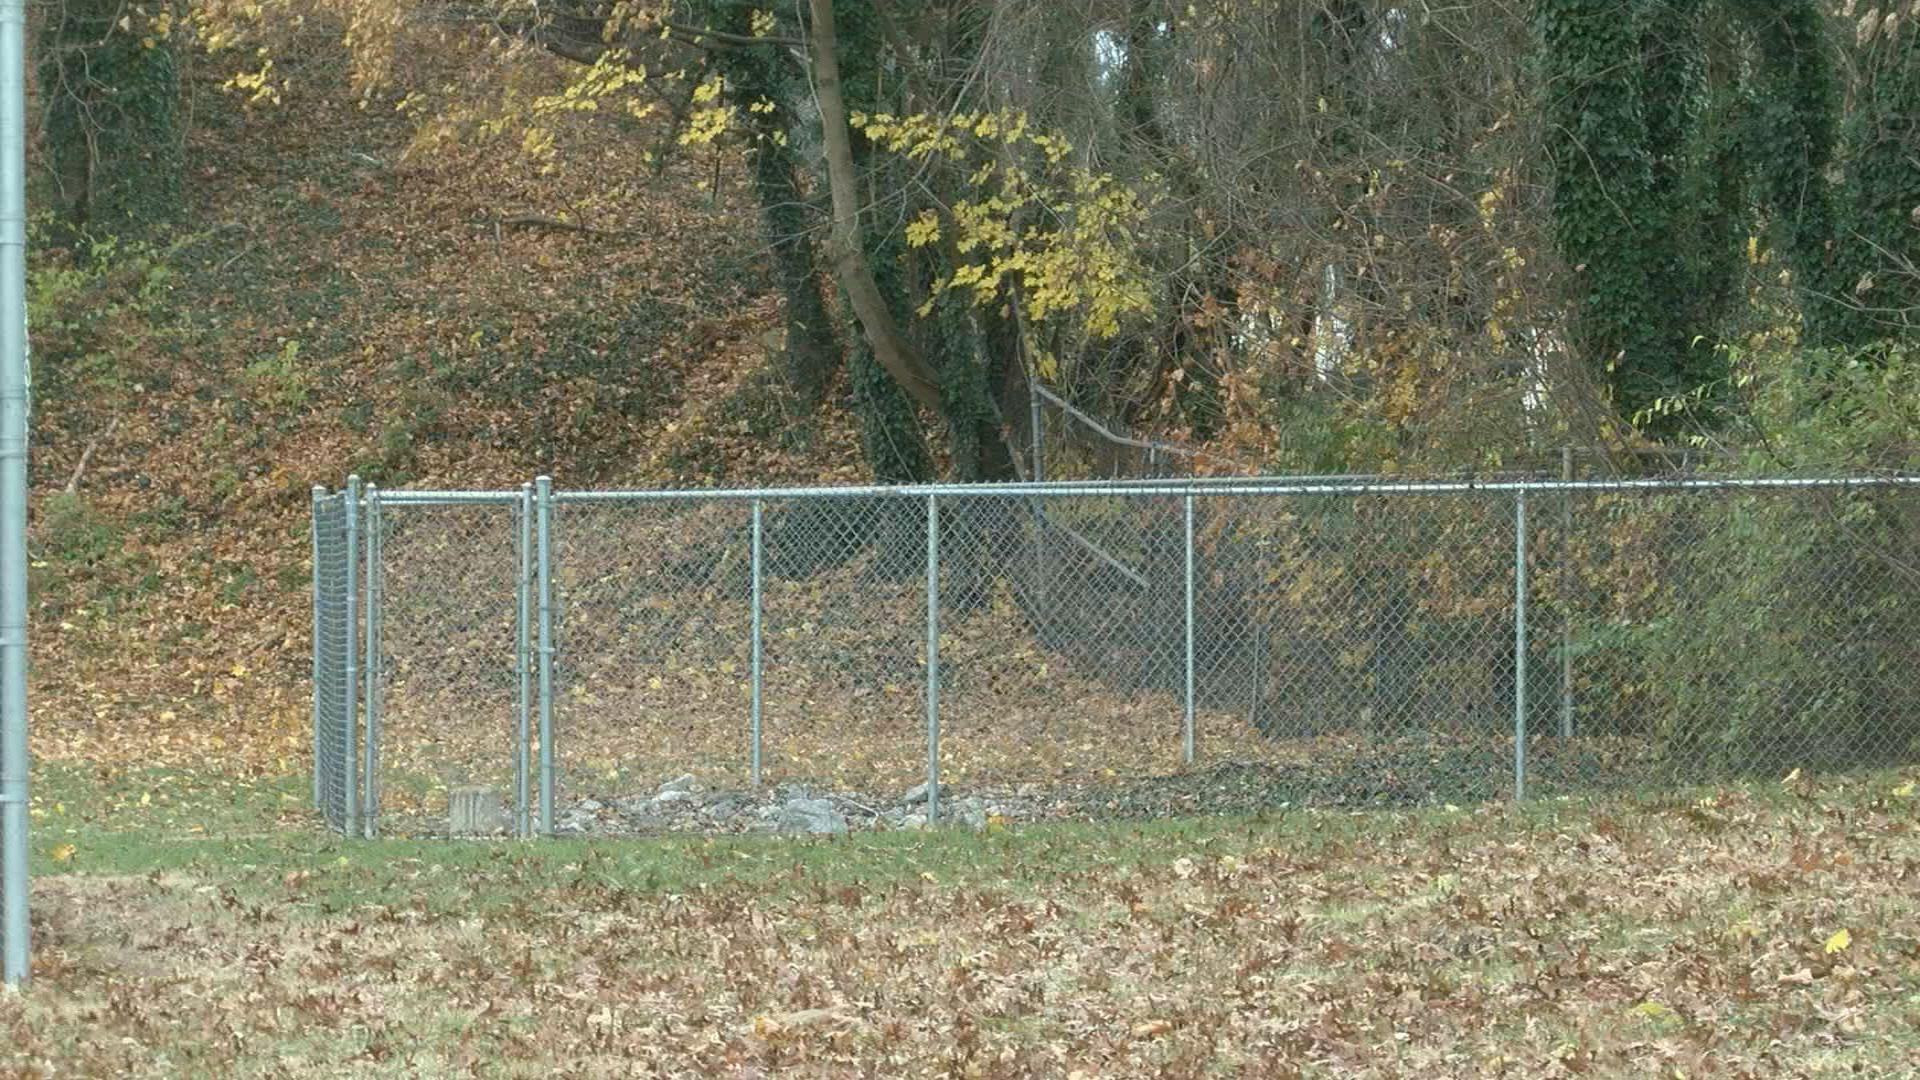 Bristol, TN police identify body of man found in city park